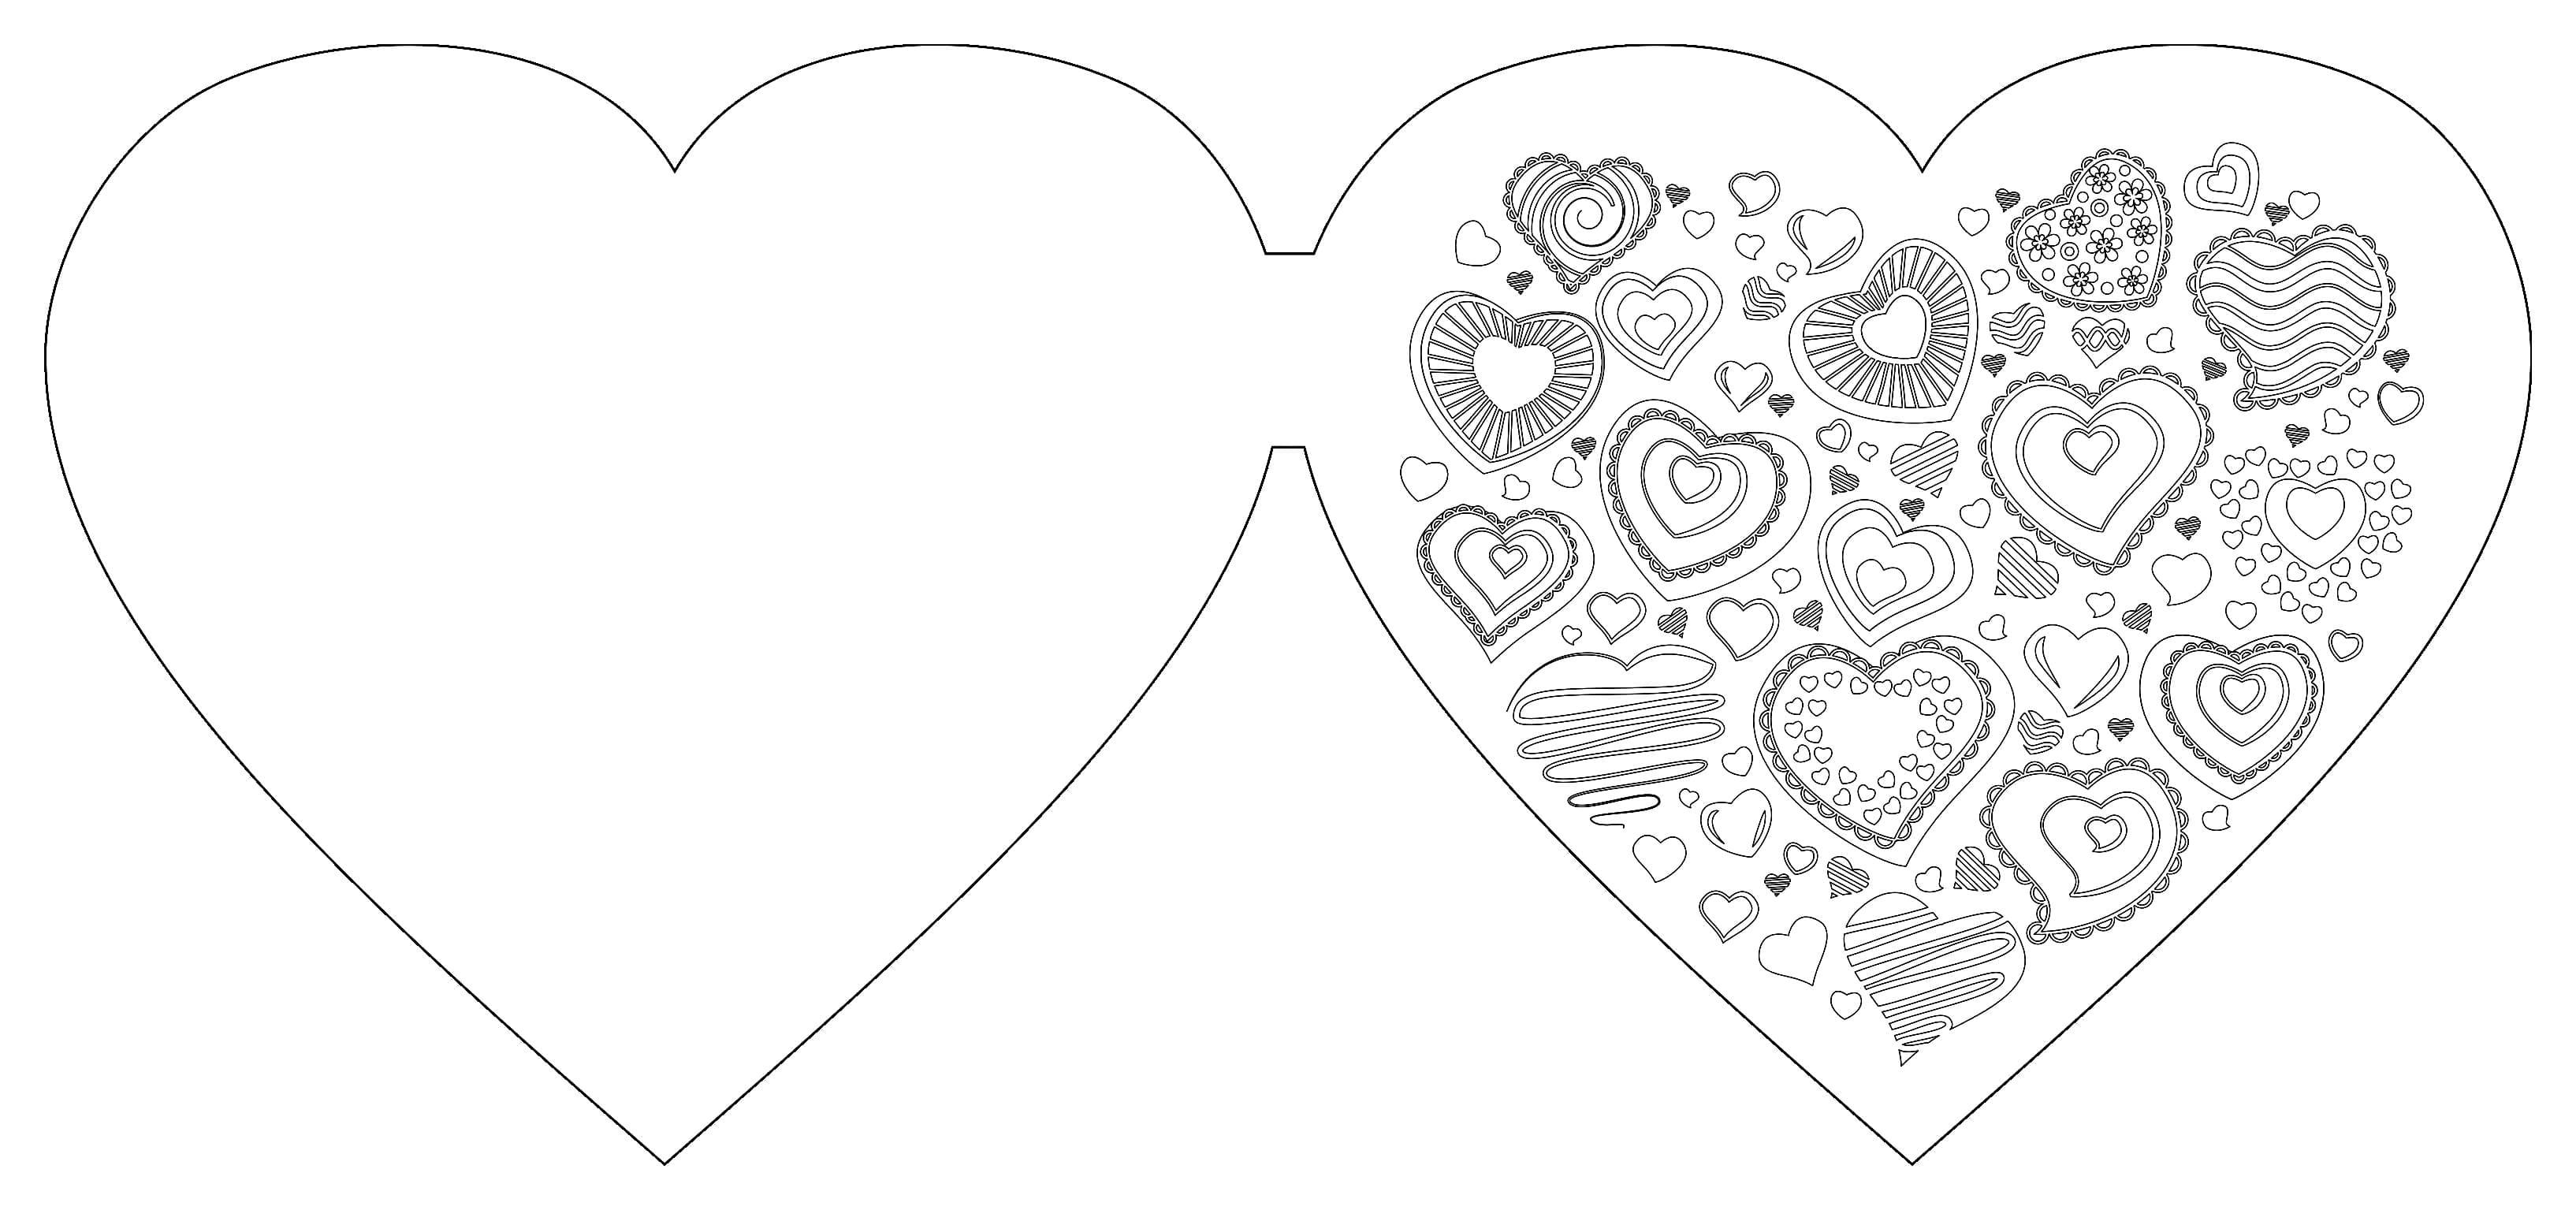 Вмф, открытка форма сердца